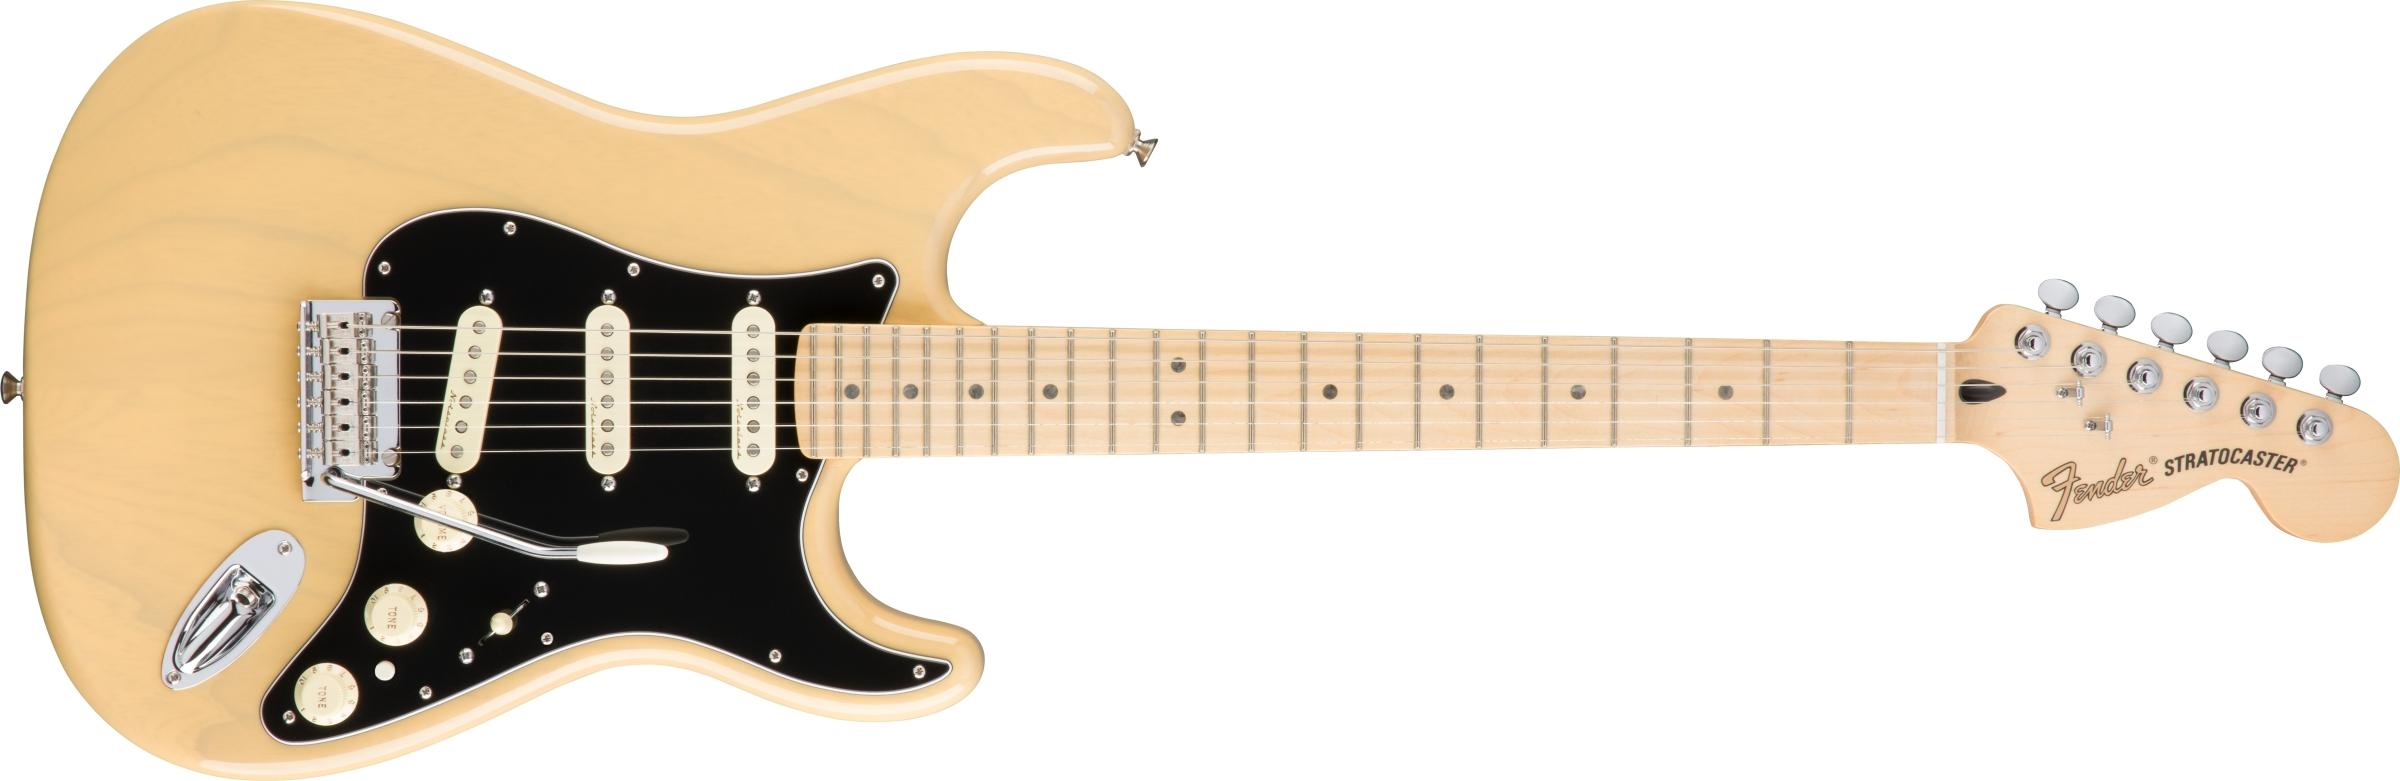 Deluxe Strat®   Electric Guitars